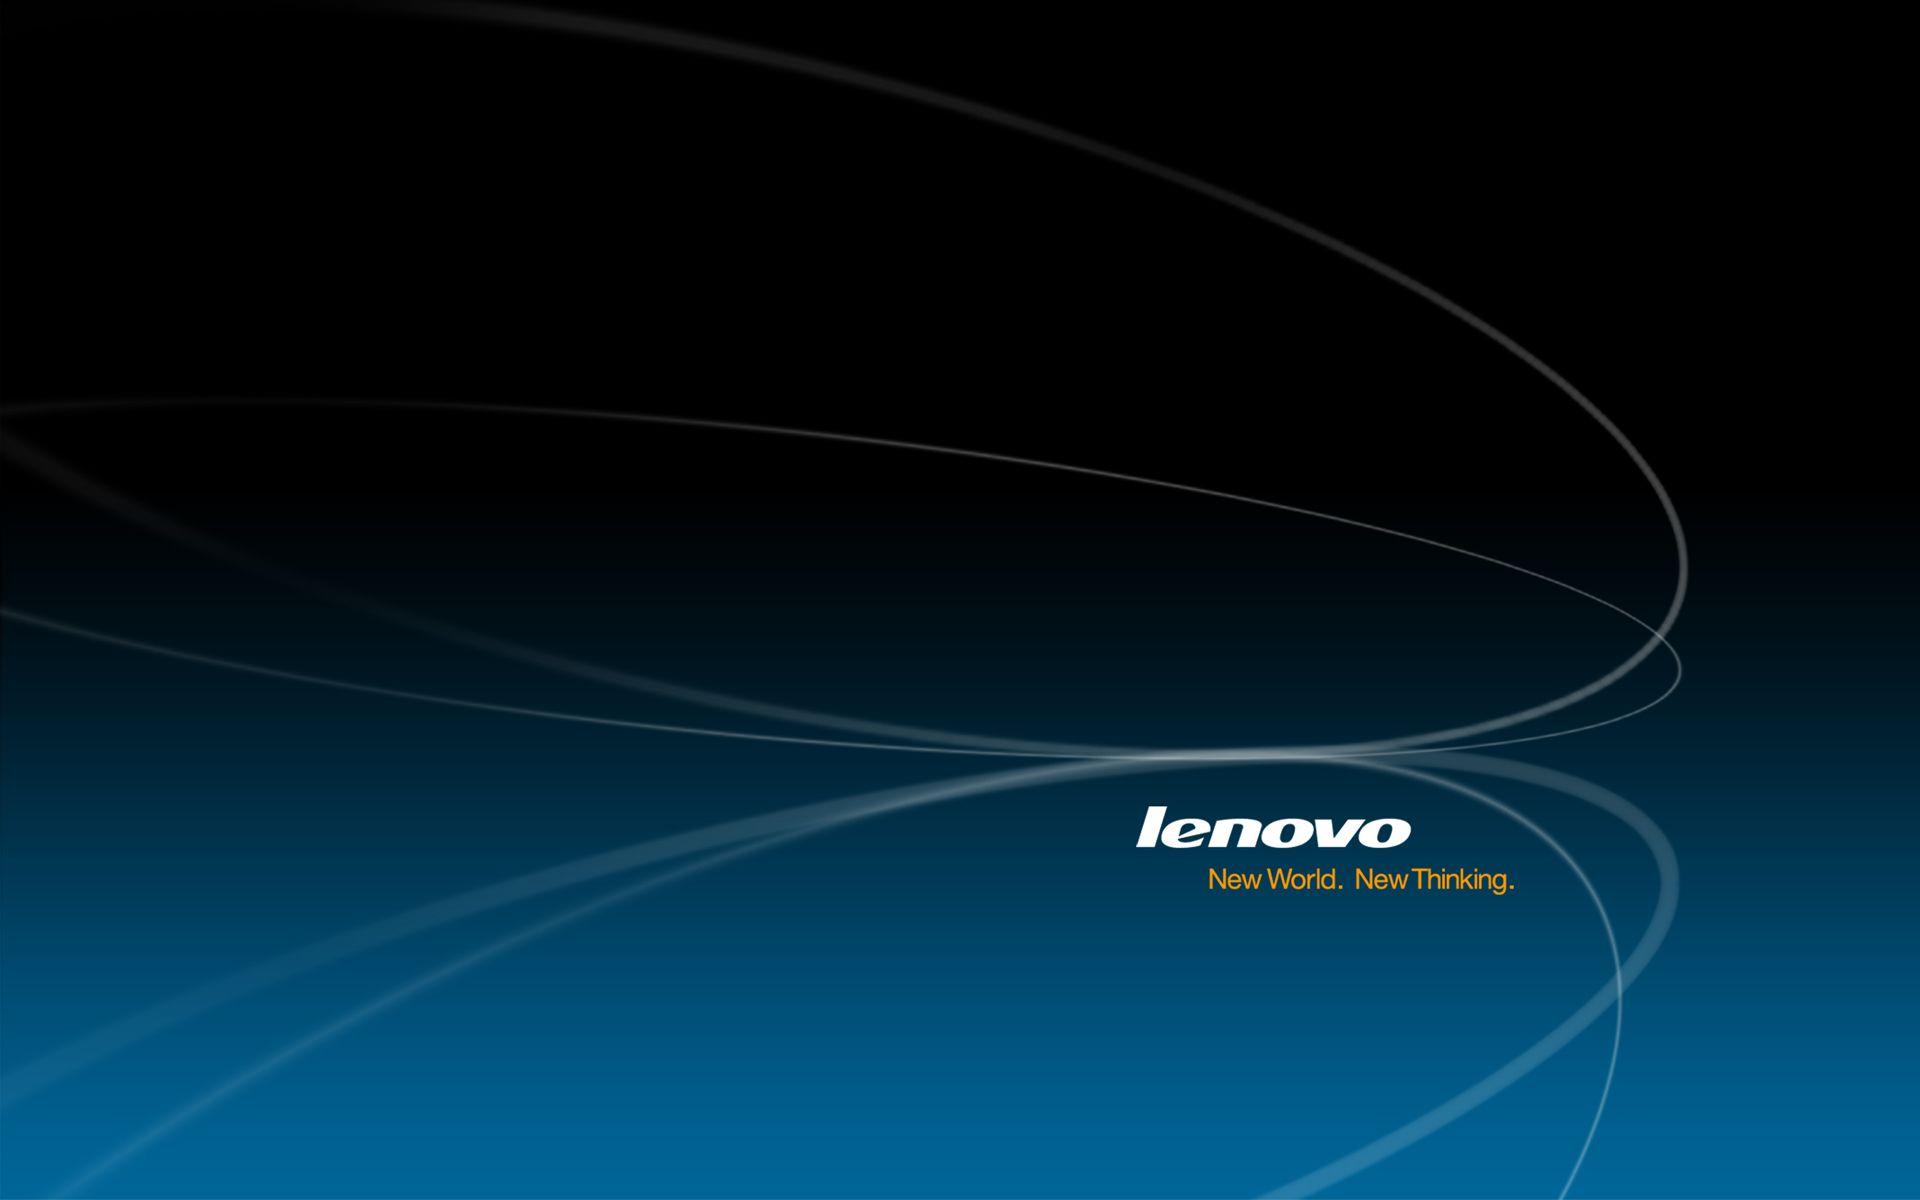 Lenovo Thinkpad Wallpapers 1920x1200